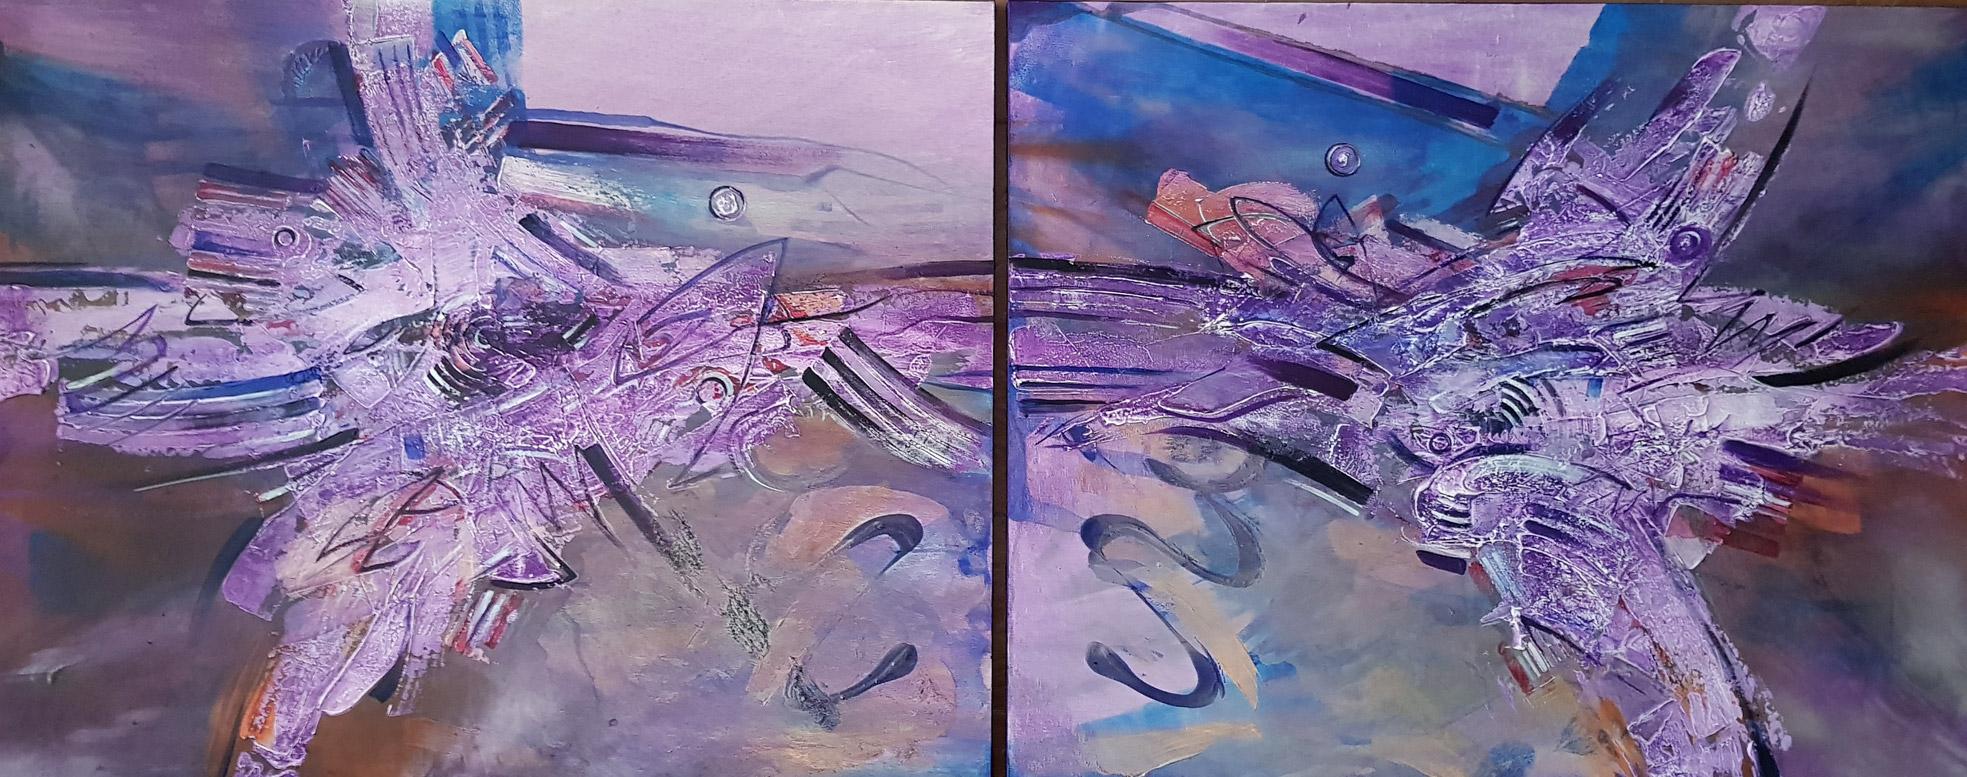 019 Purpuren dajd acryloil on